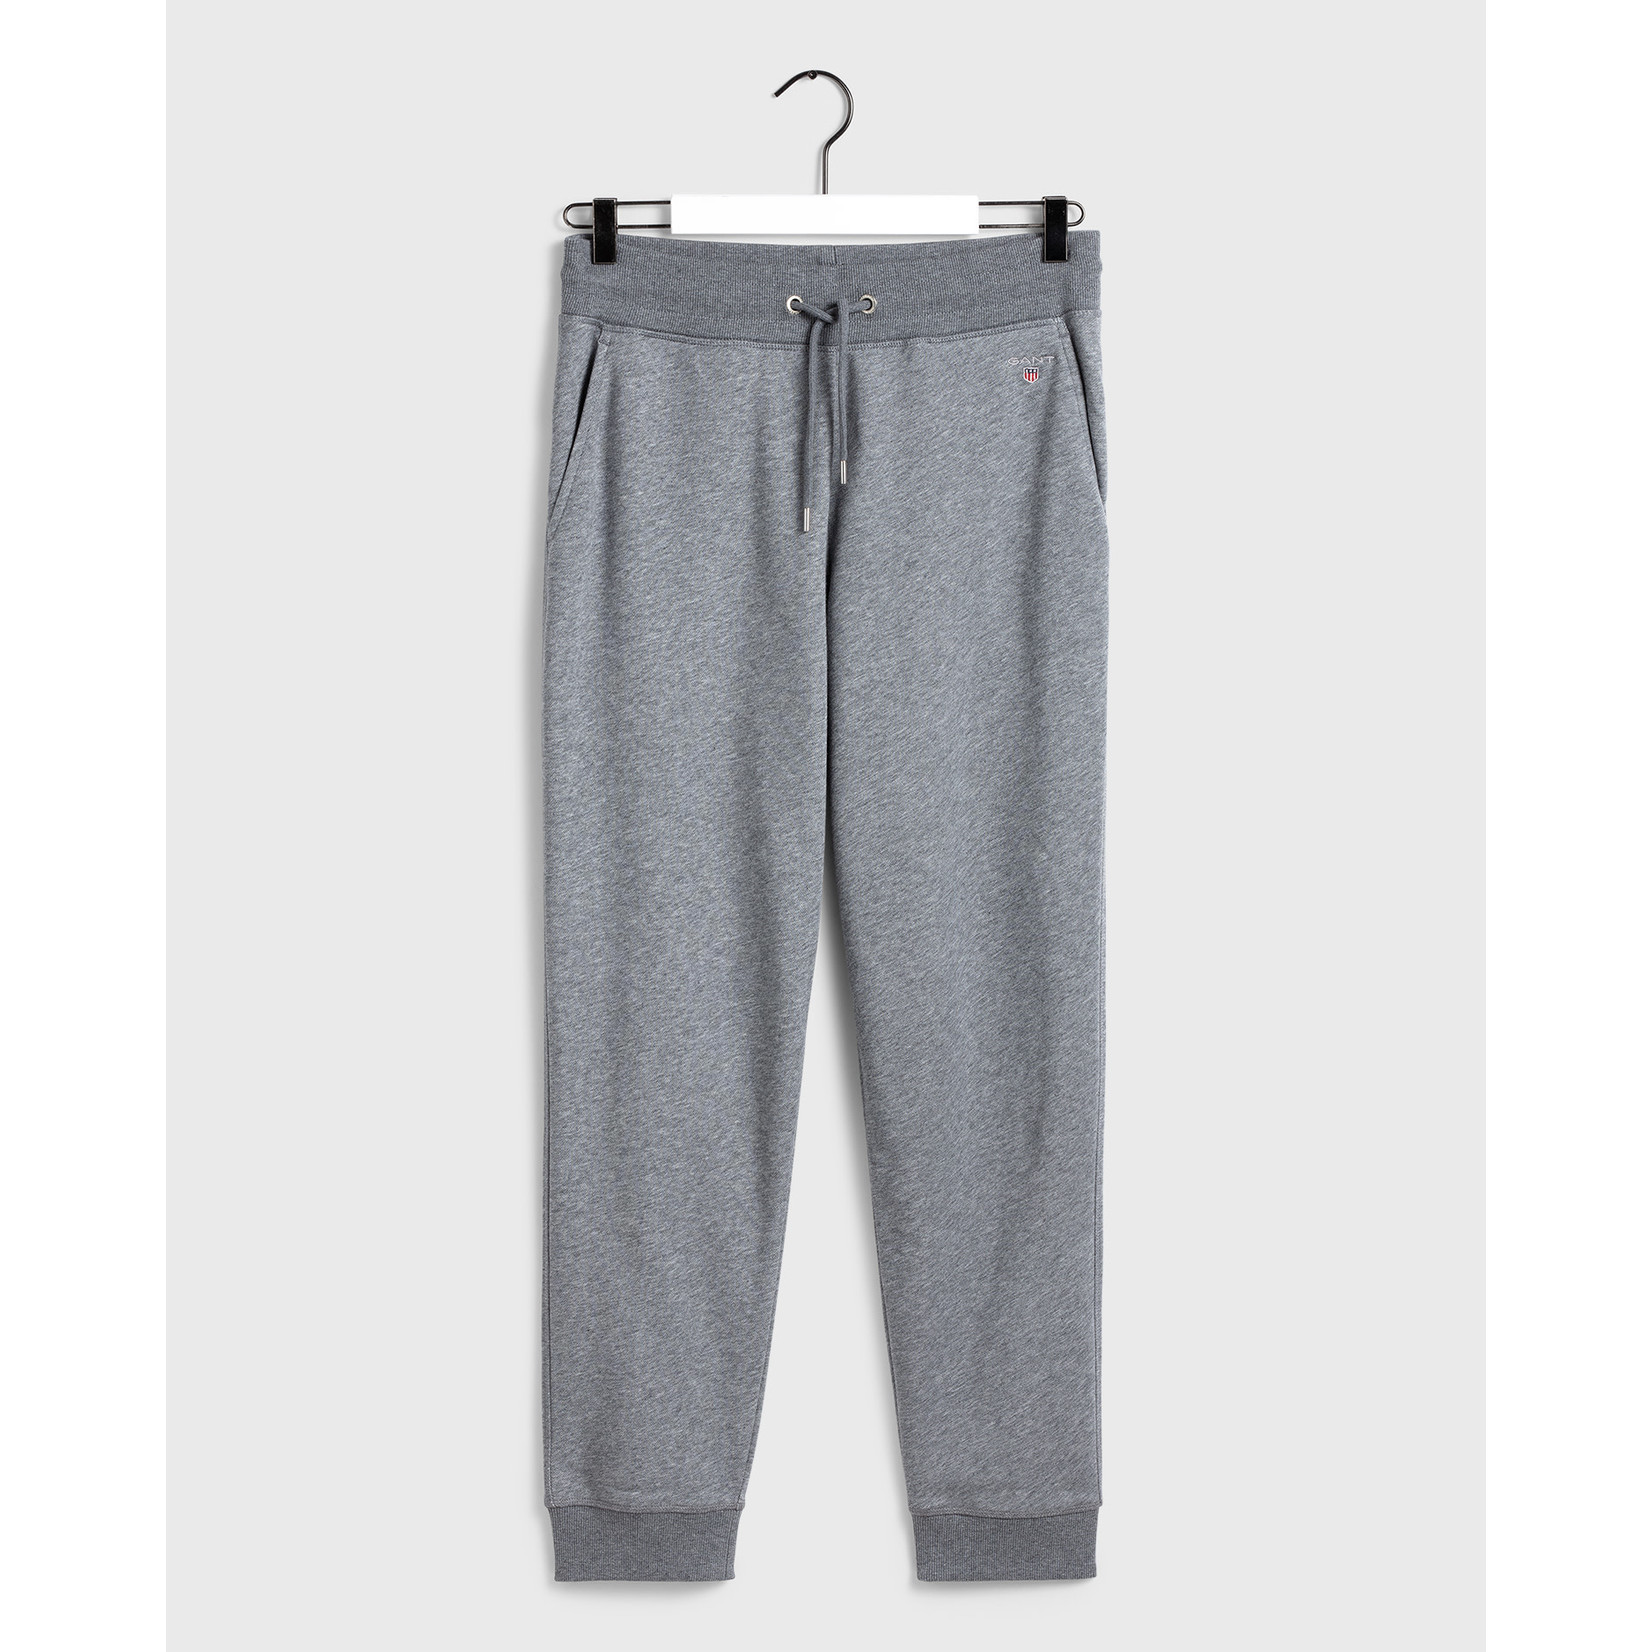 GANT joggingbroek grijs